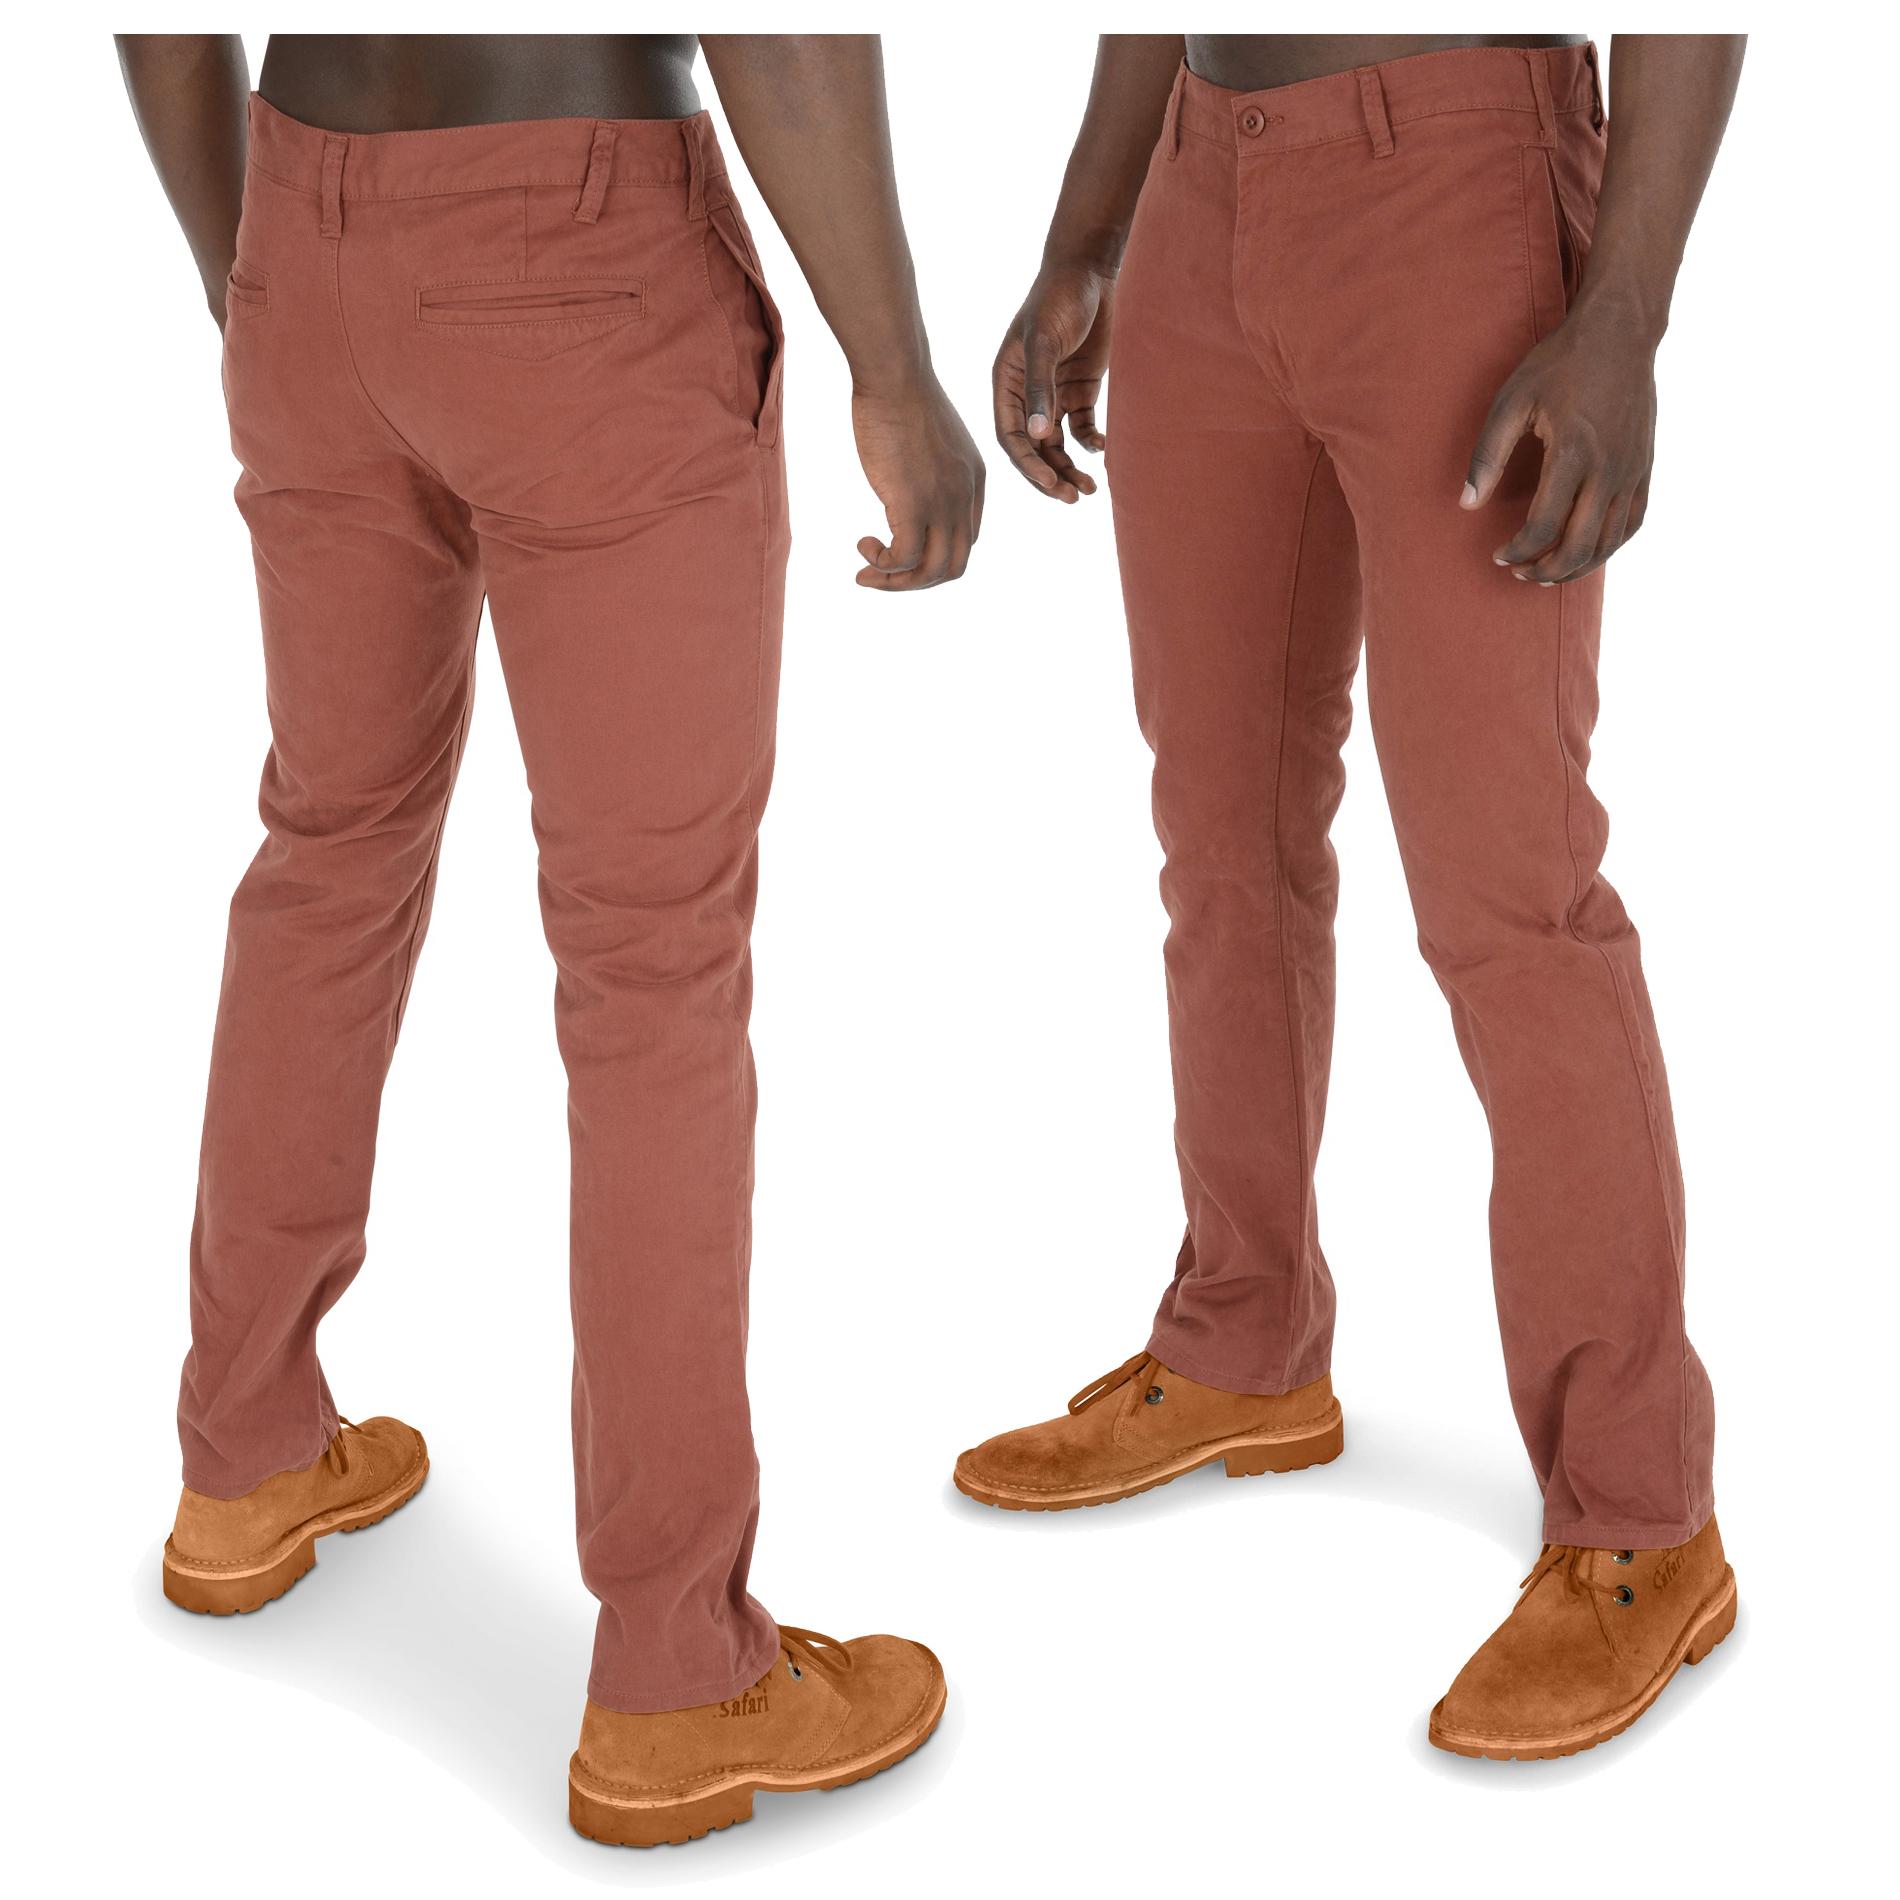 Mens Kushiro City Chinos Cotton Trousers Pants Straight Leg Casual ...